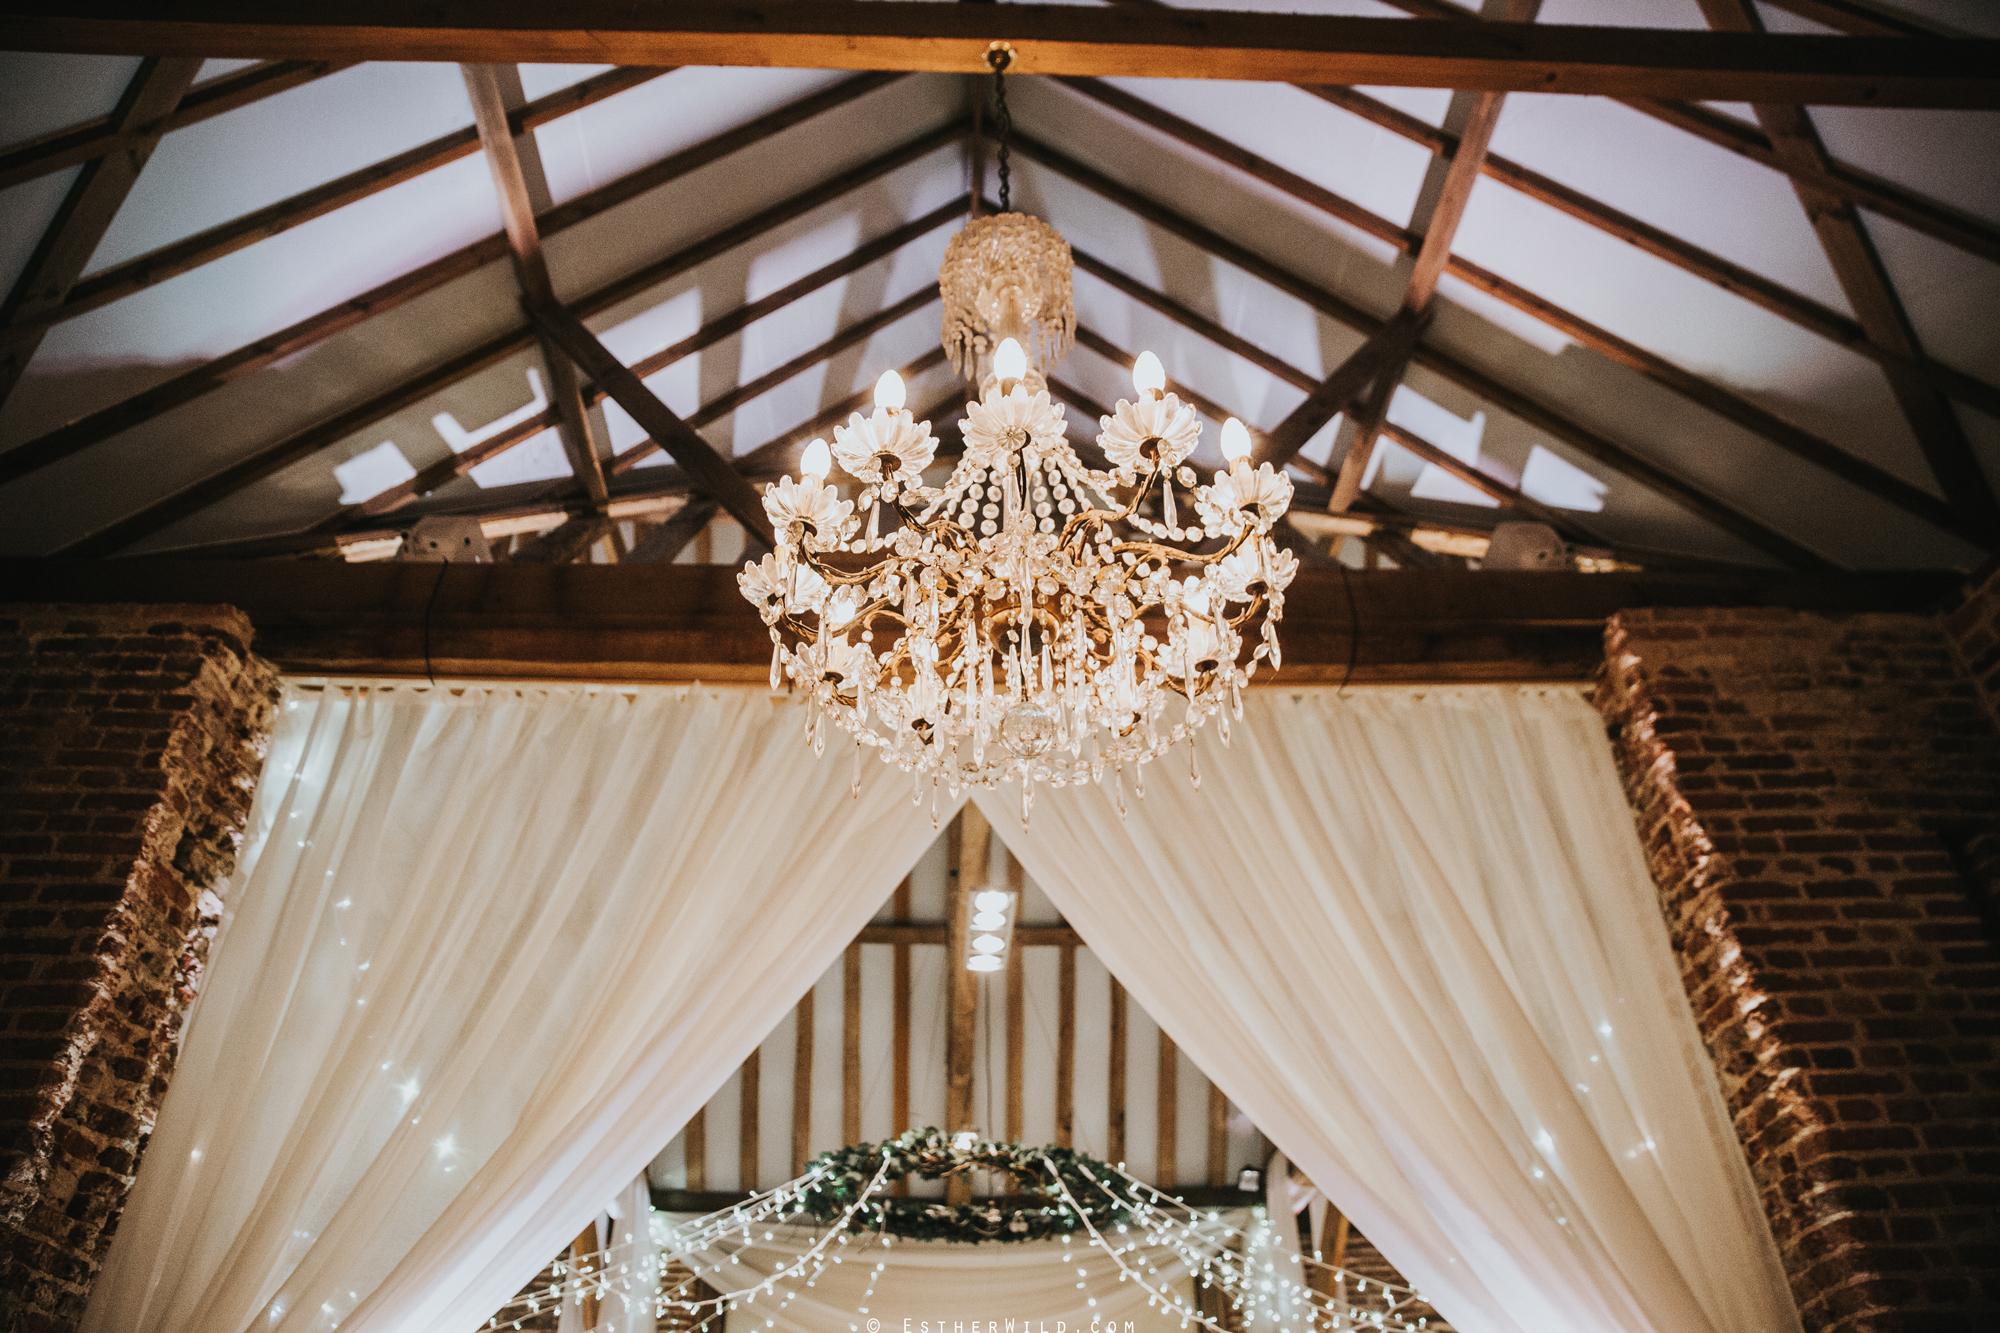 Elms_Barn_Weddings_Suffolk_Photographer_Copyright_Esther_Wild_IMG_2241.jpg